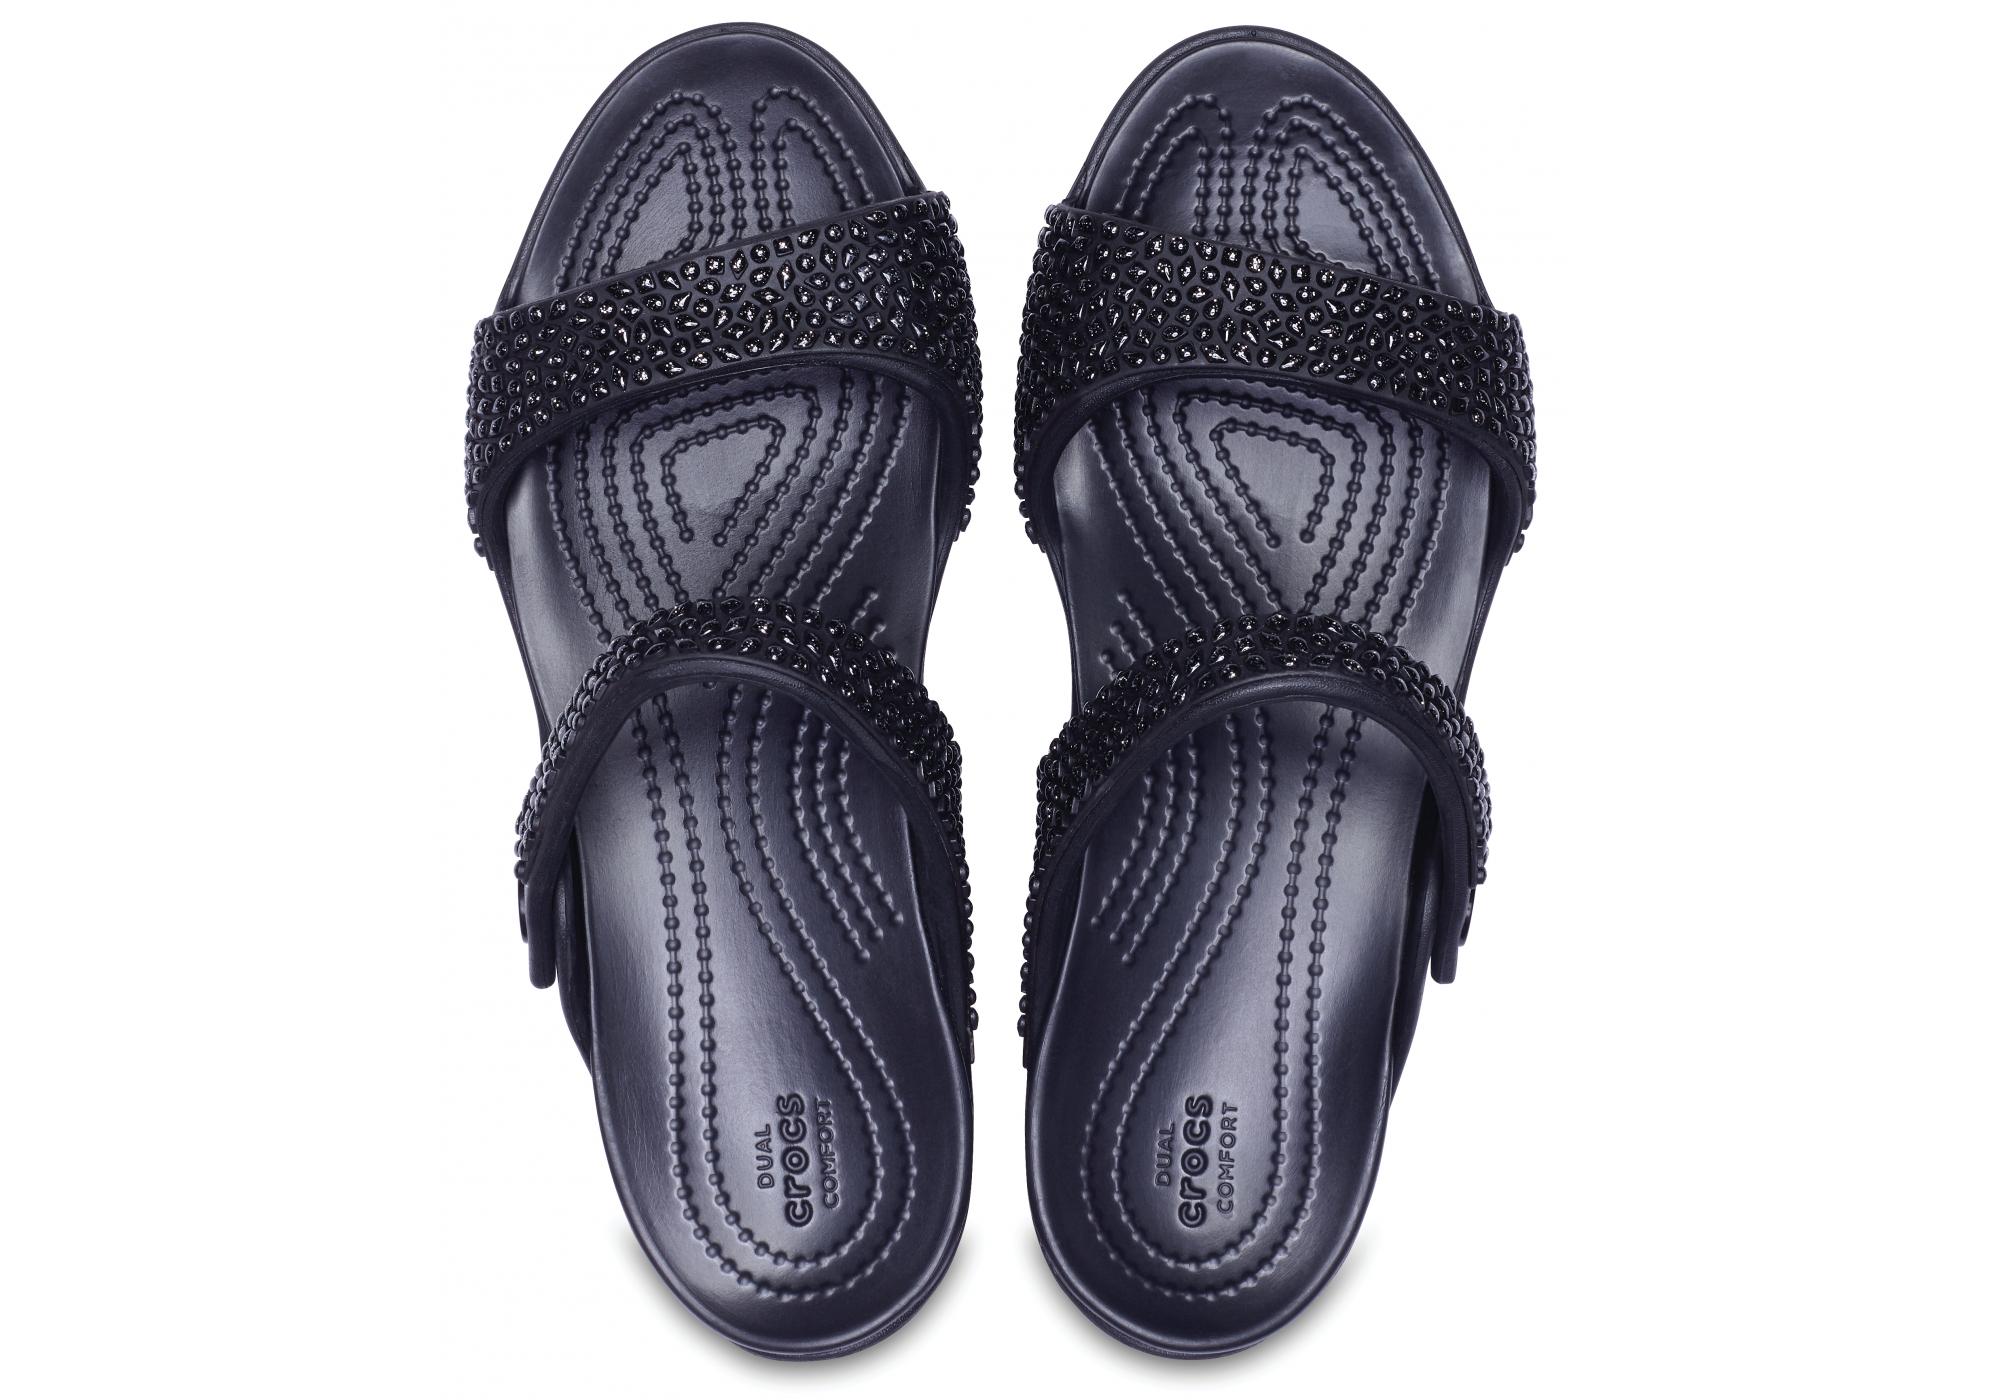 b8429b02231d dámské sandály Crocs Cleo V Diamante Sandal W